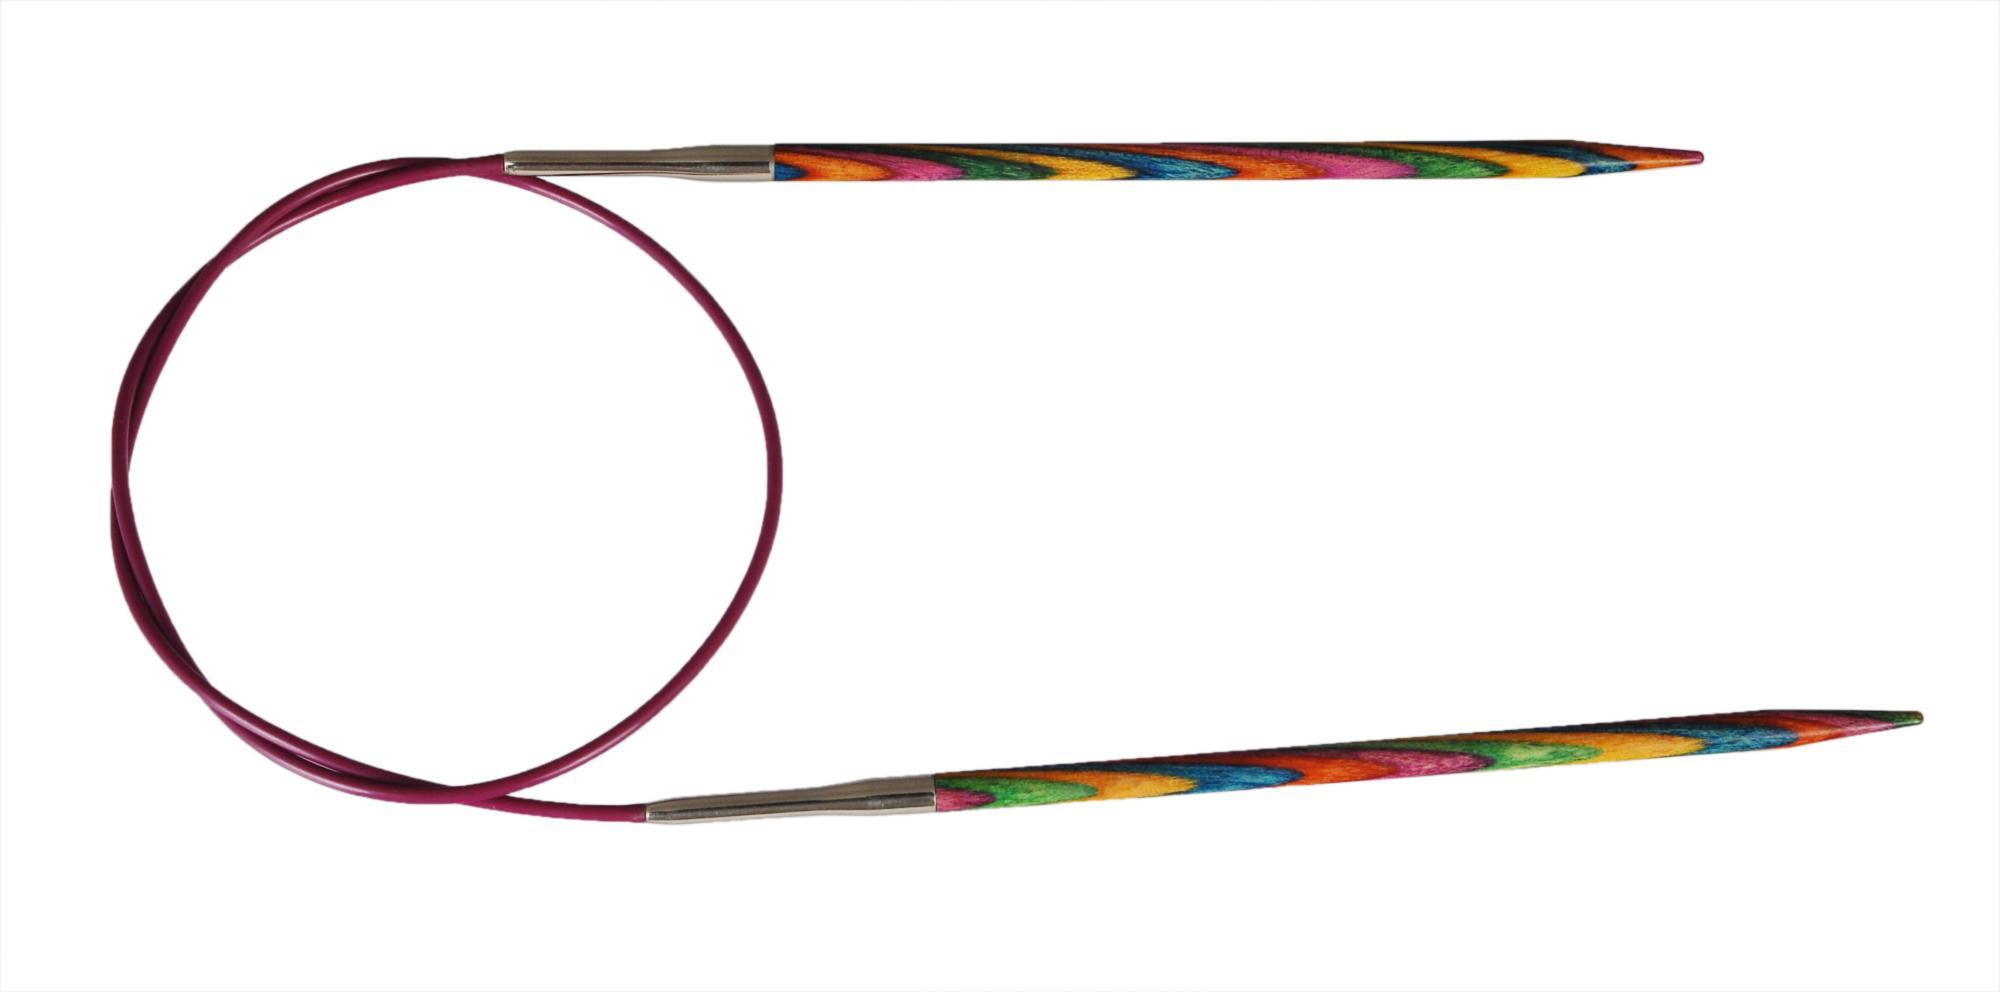 Спицы круговые 80 см Symfonie Wood KnitPro, 21343, 7.00 мм